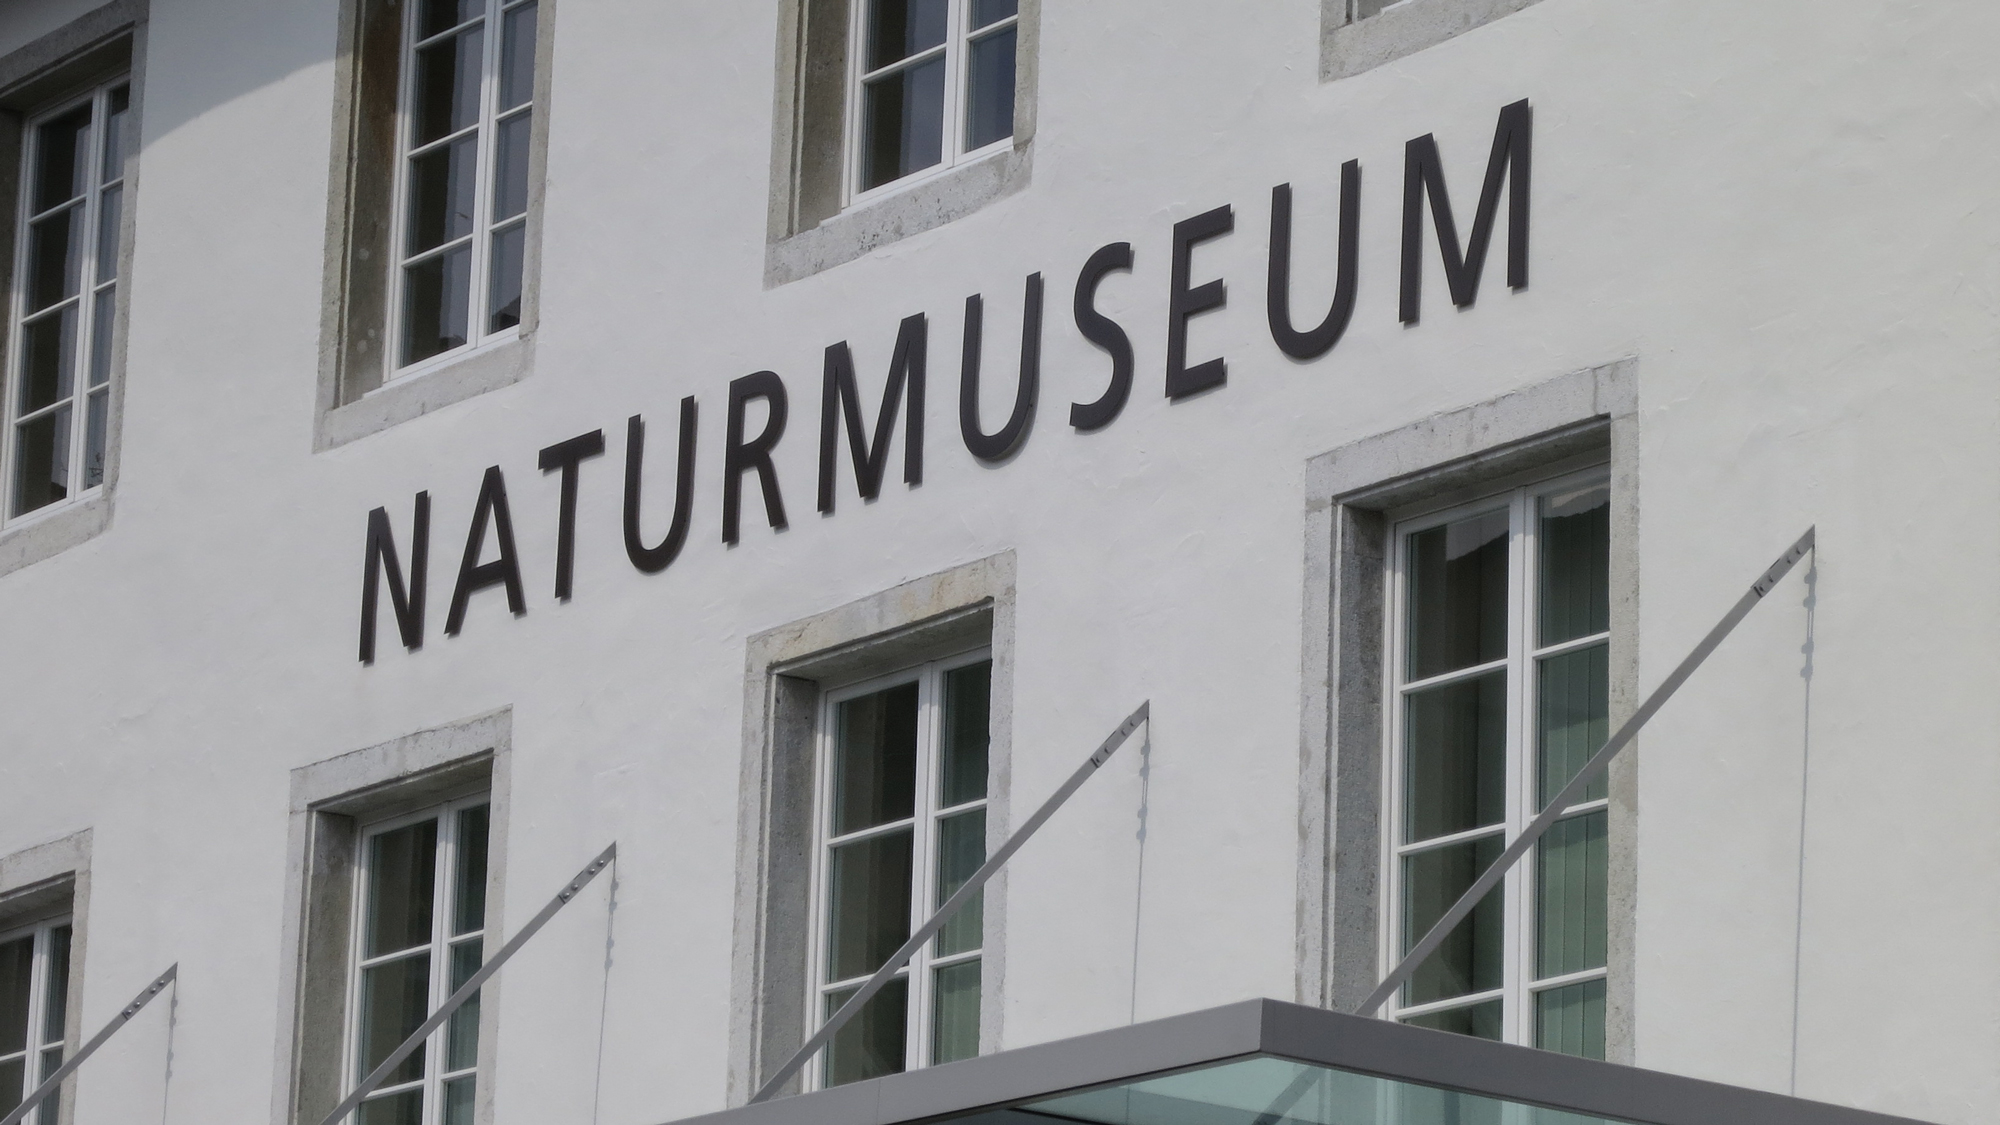 Metallschriften - Aluminium- Kunststoff Acrylglasbuchstaben